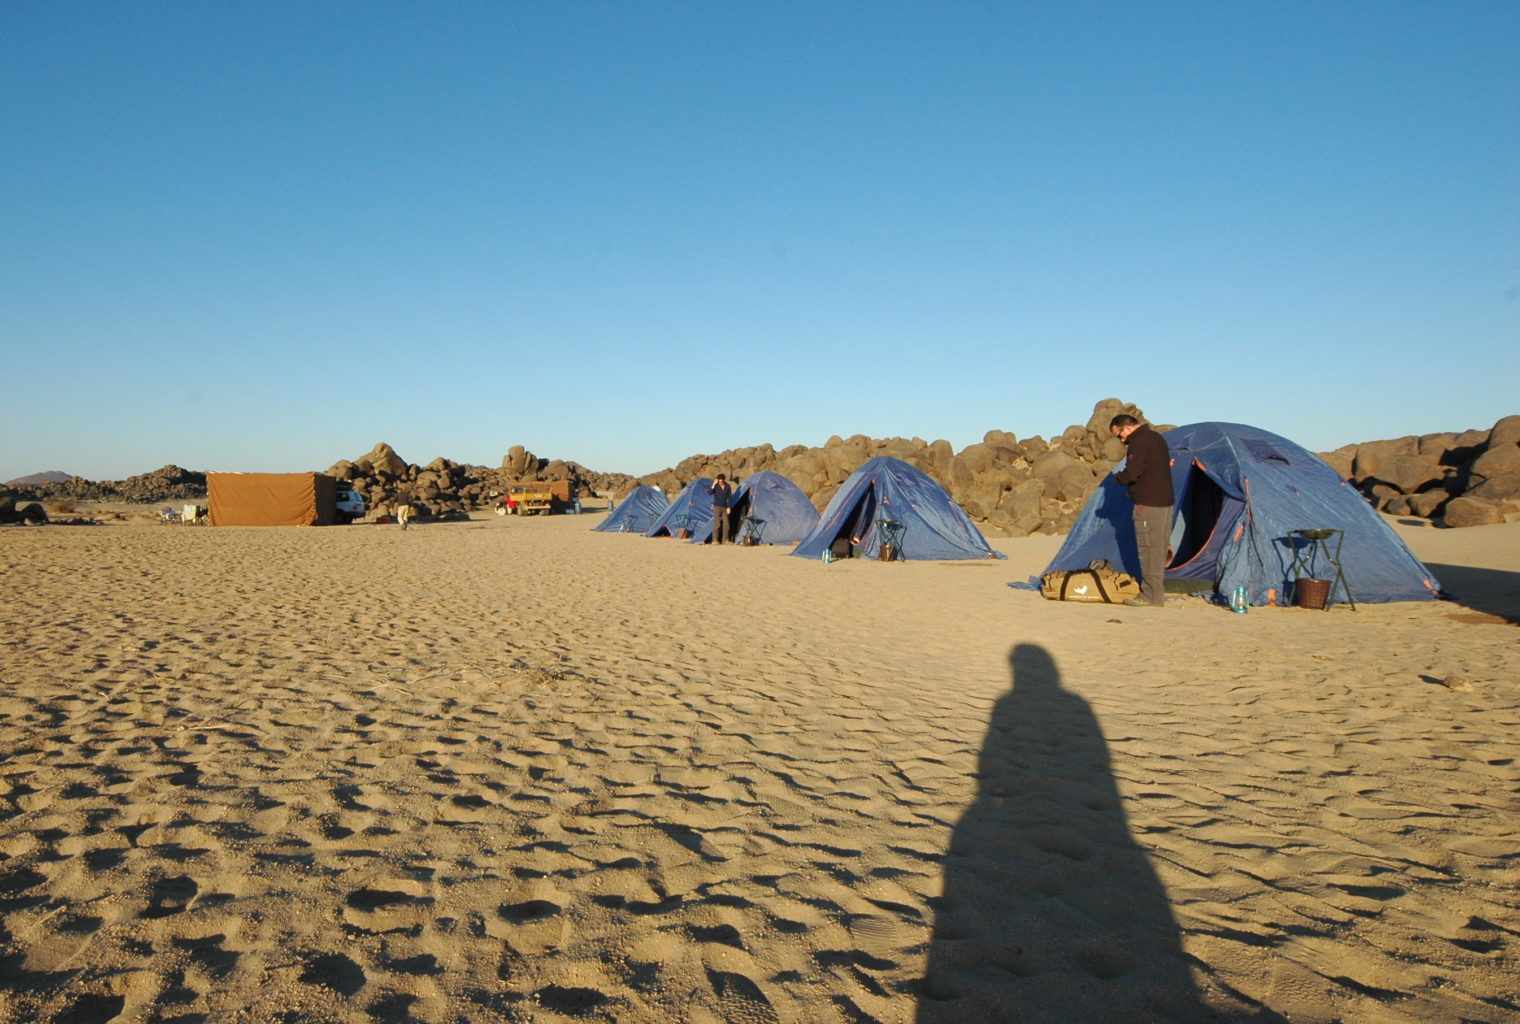 Tombos Wild Camping Sudan Tents